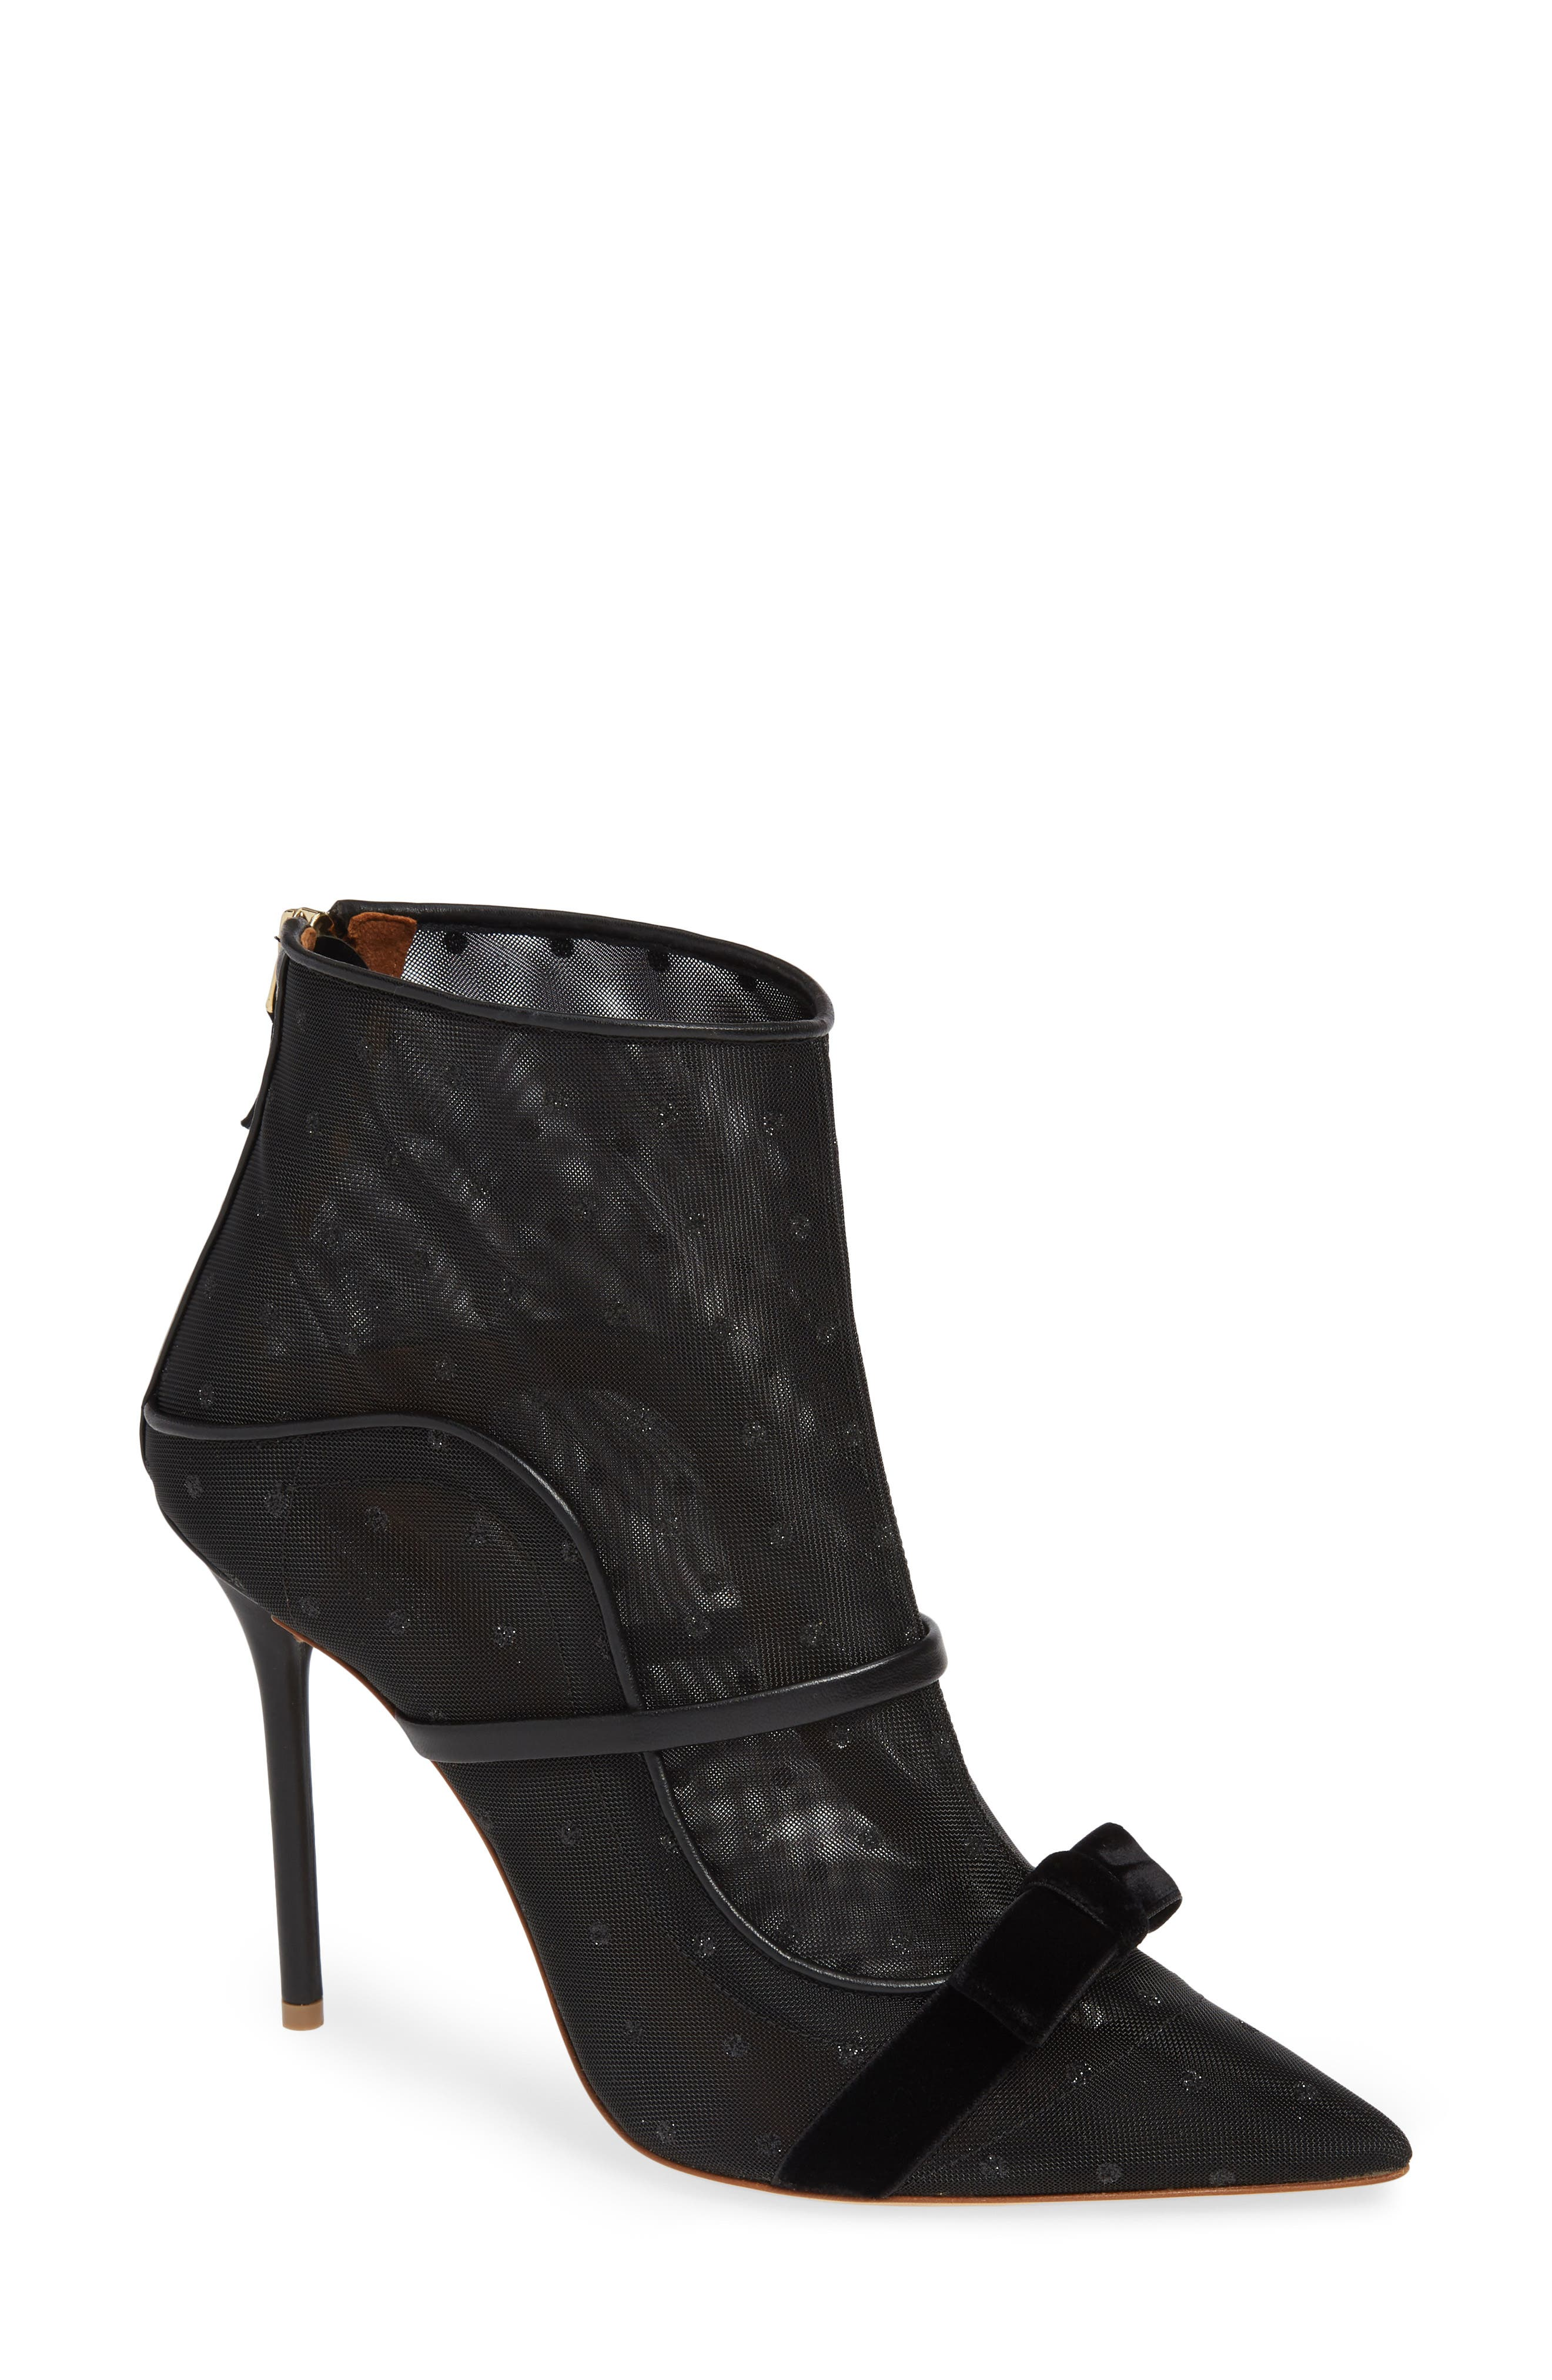 0cf6e77dc5e5 Women s Malone Souliers Shoes